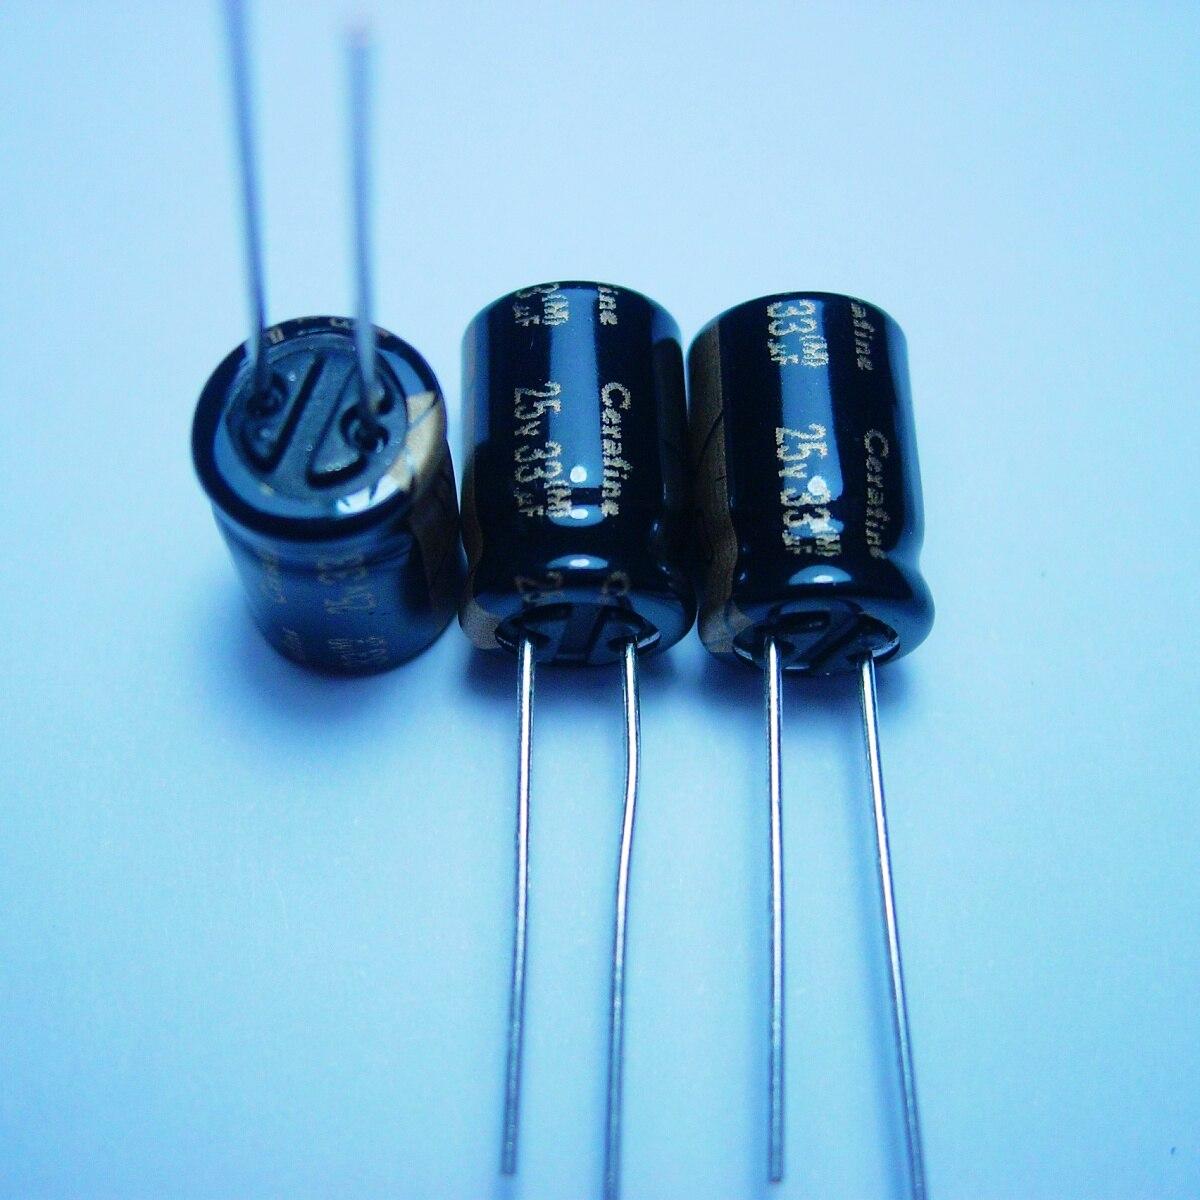 10pcs/20pcs ELNA Cerafine 25v33uf copper feet audio capacitance audio super capacitor electrolytic capacitors free shipping 5pcs 10pcs elna silmcii 16v2200uf 18 40 copper capacitor audio super capacitor electrolytic capacitors free shipping